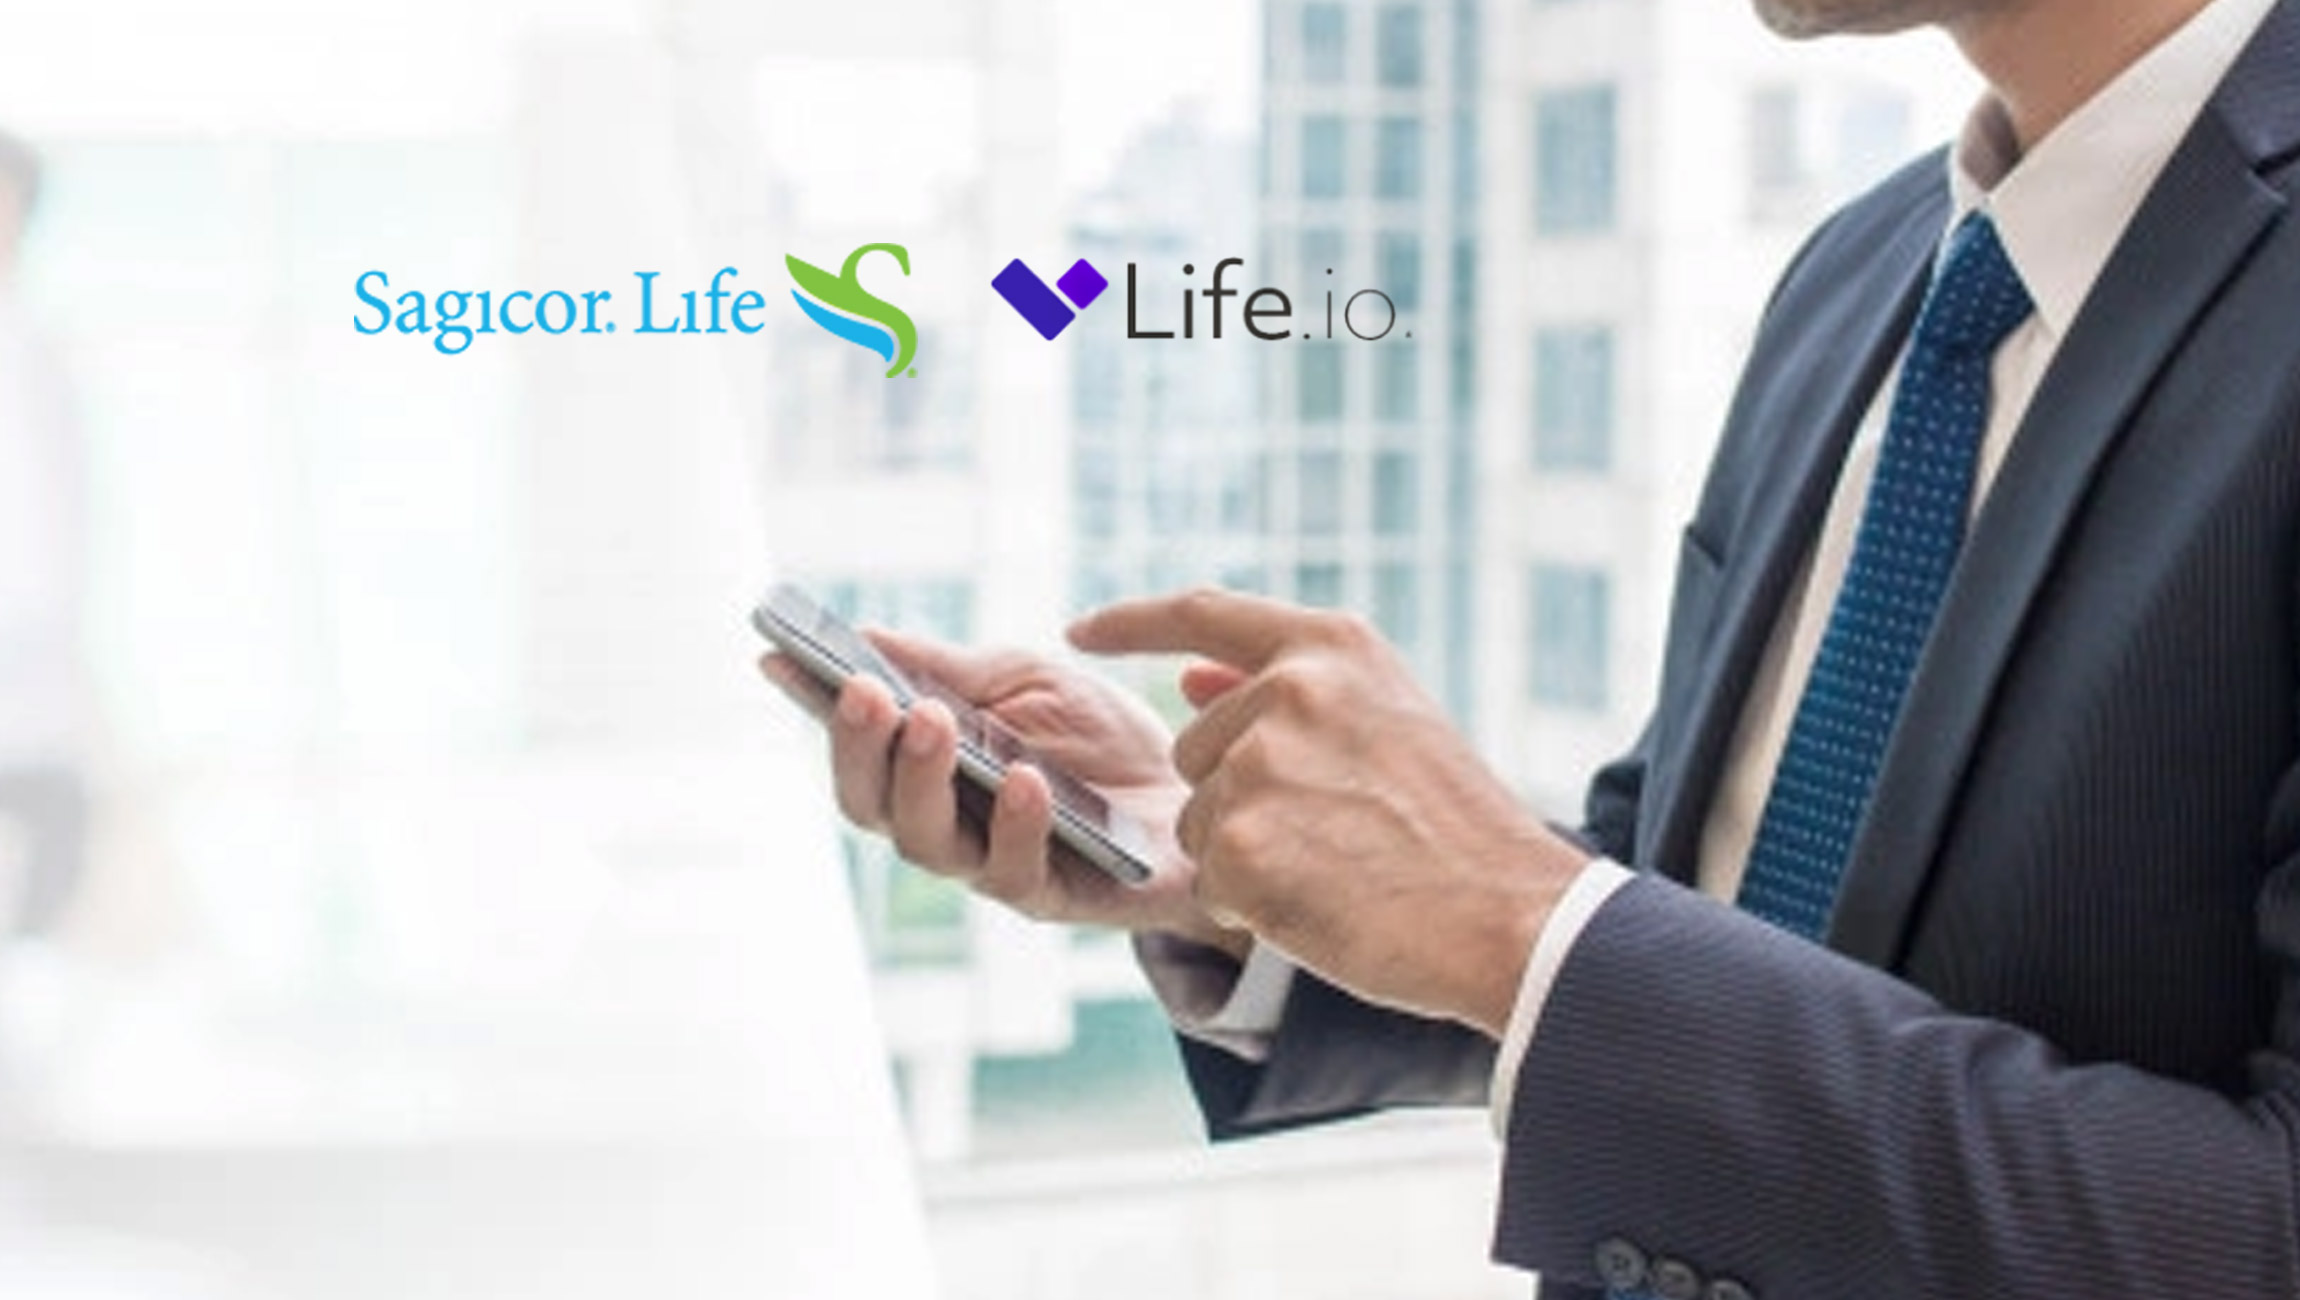 Sagicor-Launches-Digital-Engagement-Platform-with-Life.io